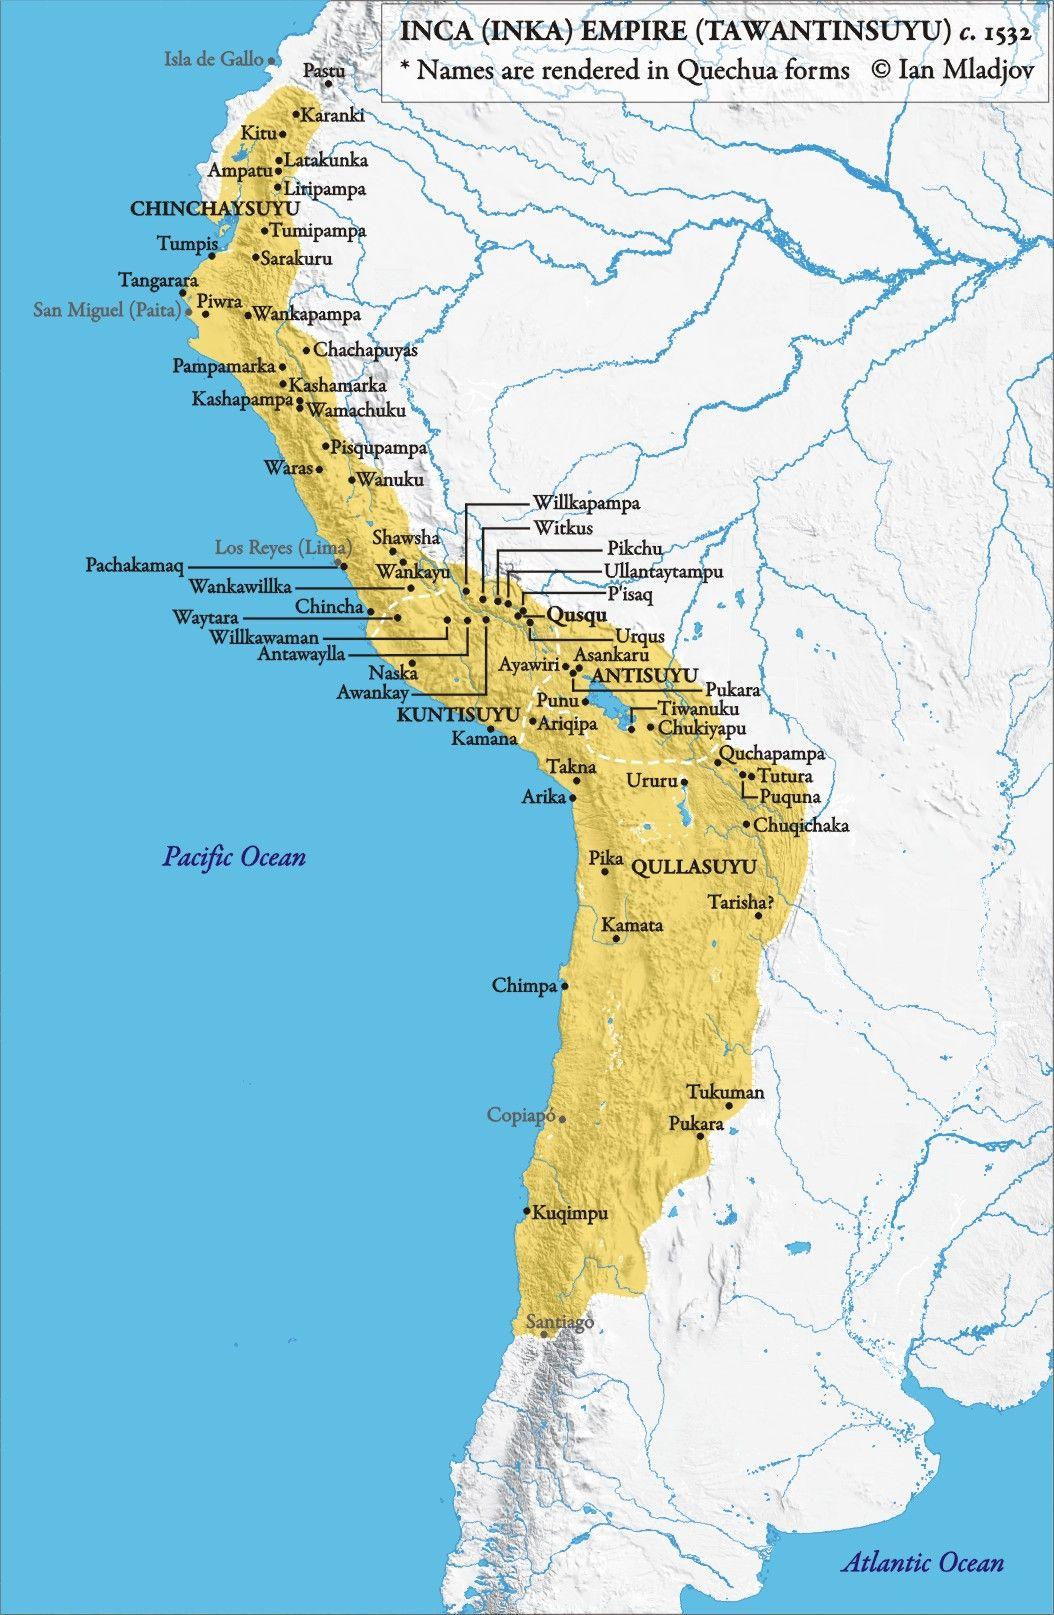 Peachy Incan Empire Original Peoples Map Historical Maps Map Download Free Architecture Designs Scobabritishbridgeorg